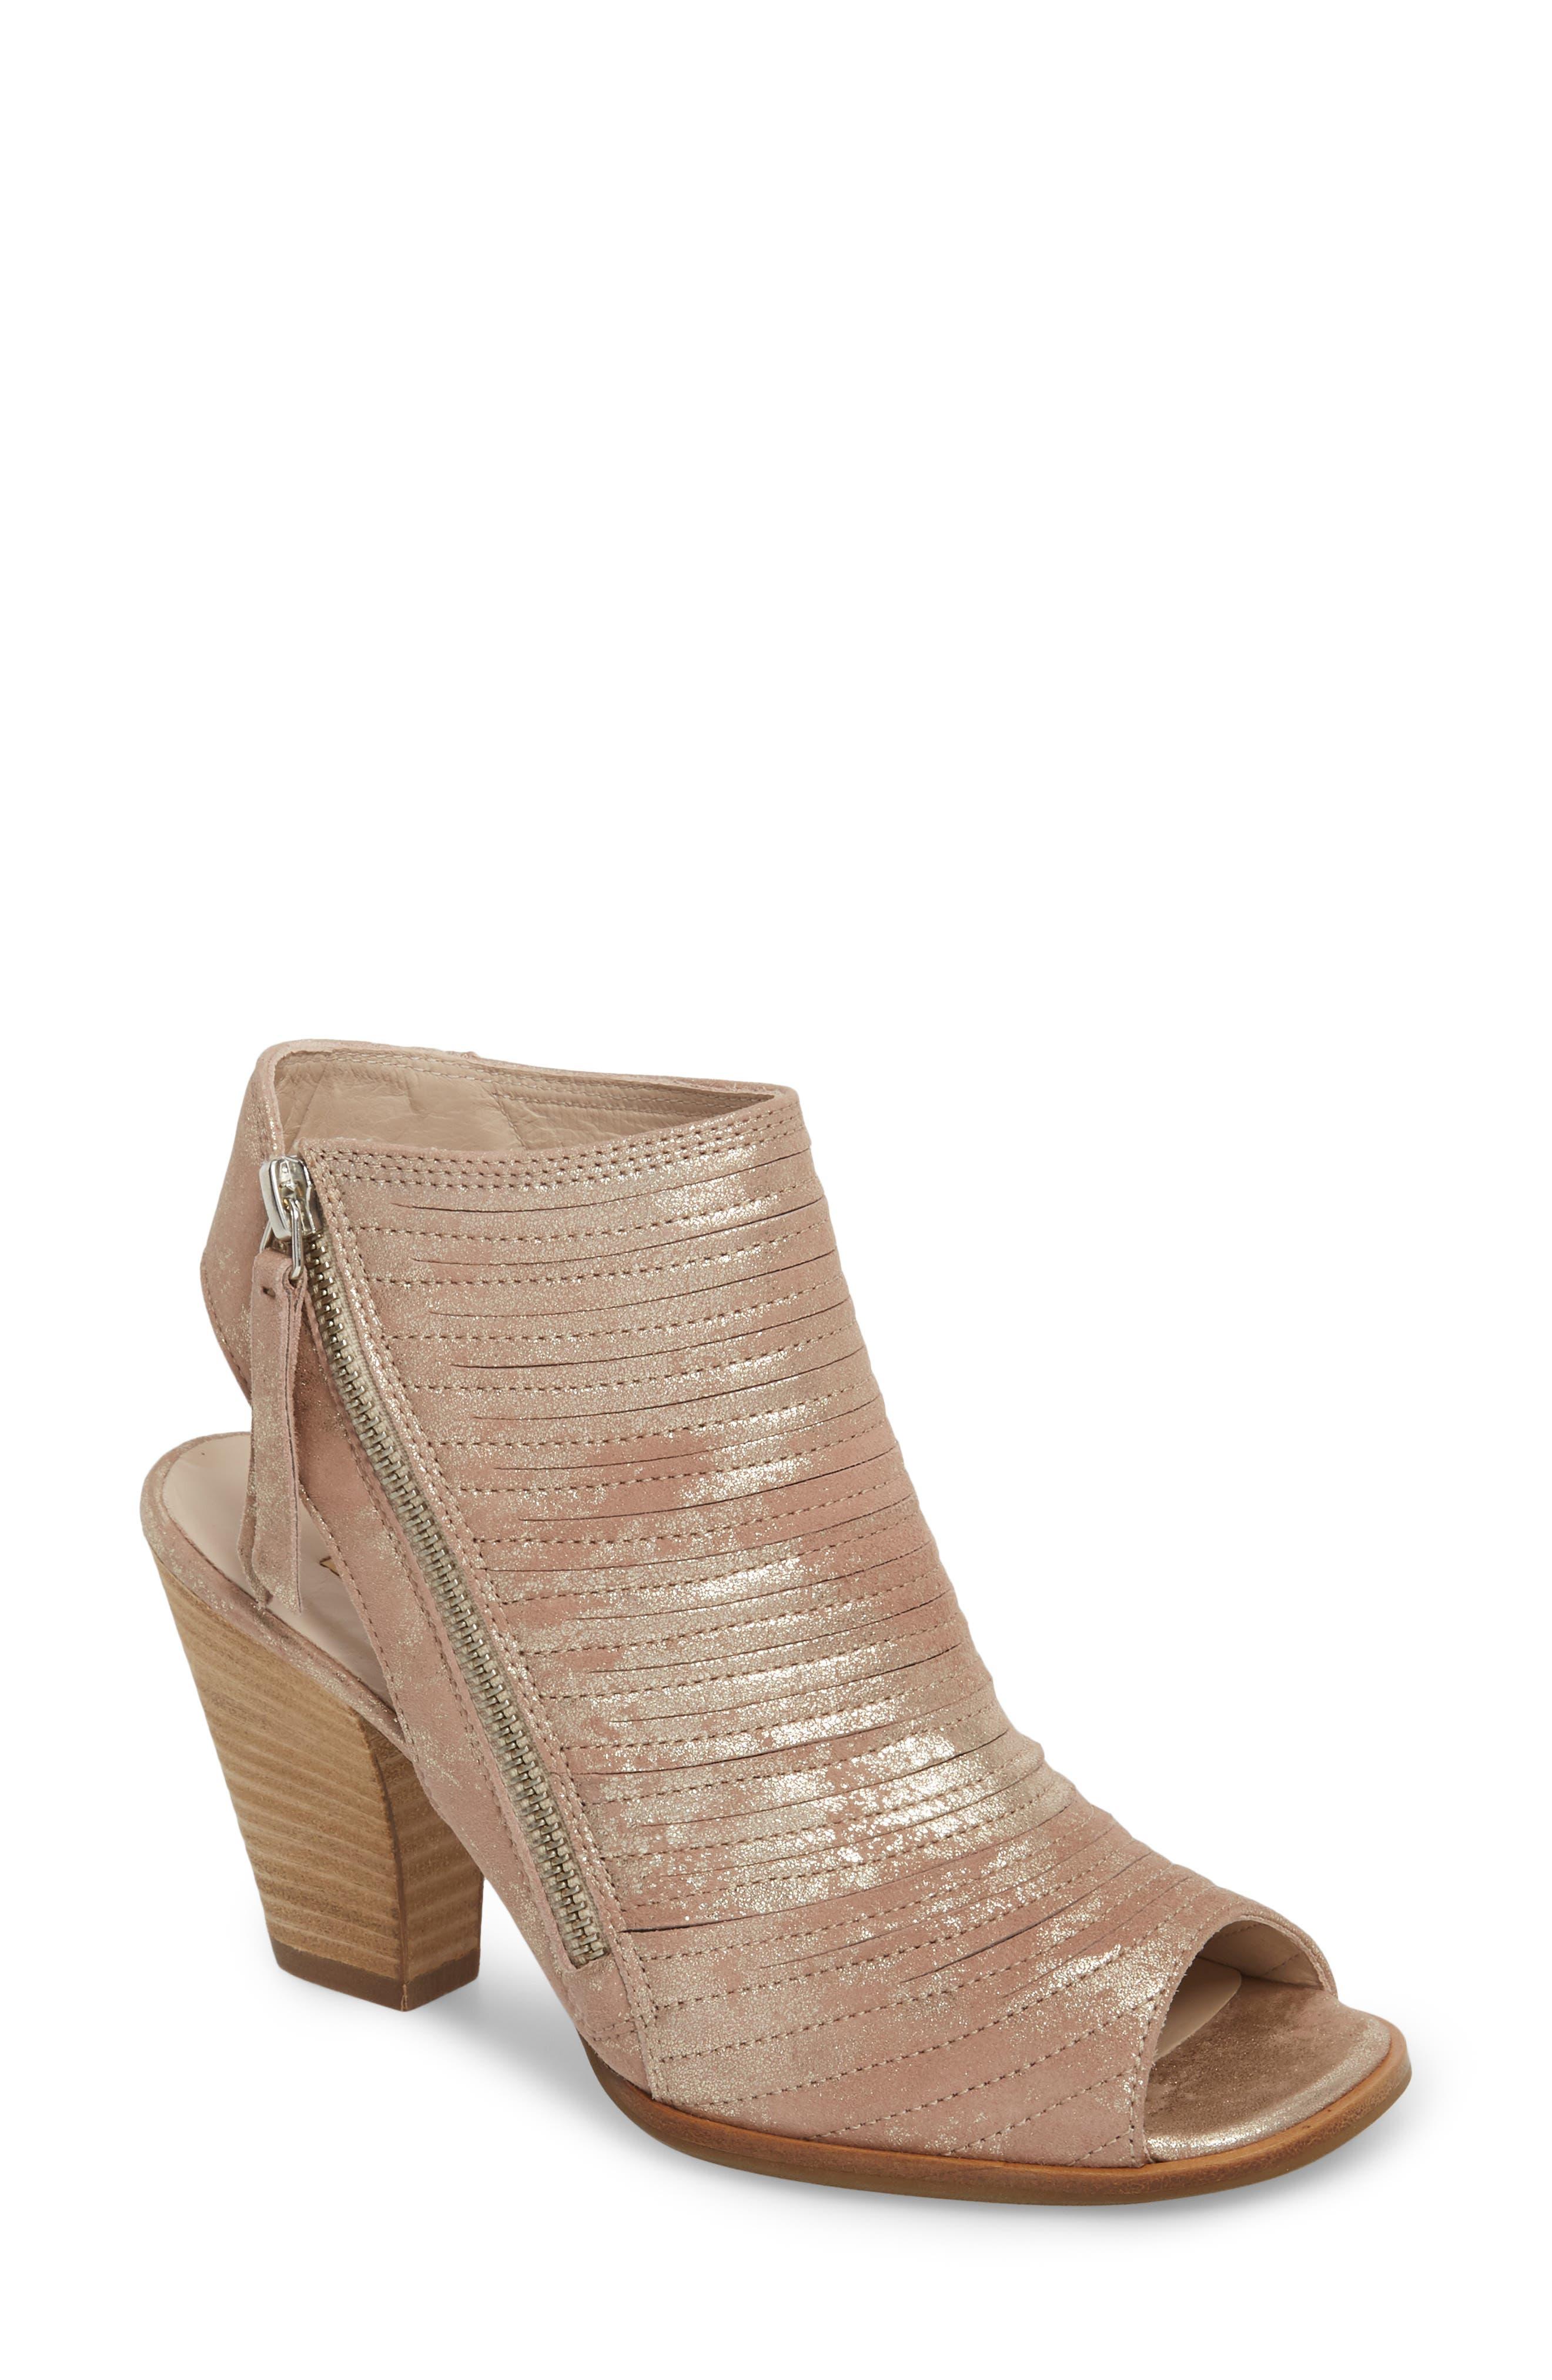 'Cayanne' Leather Peep Toe Sandal,                             Main thumbnail 3, color,